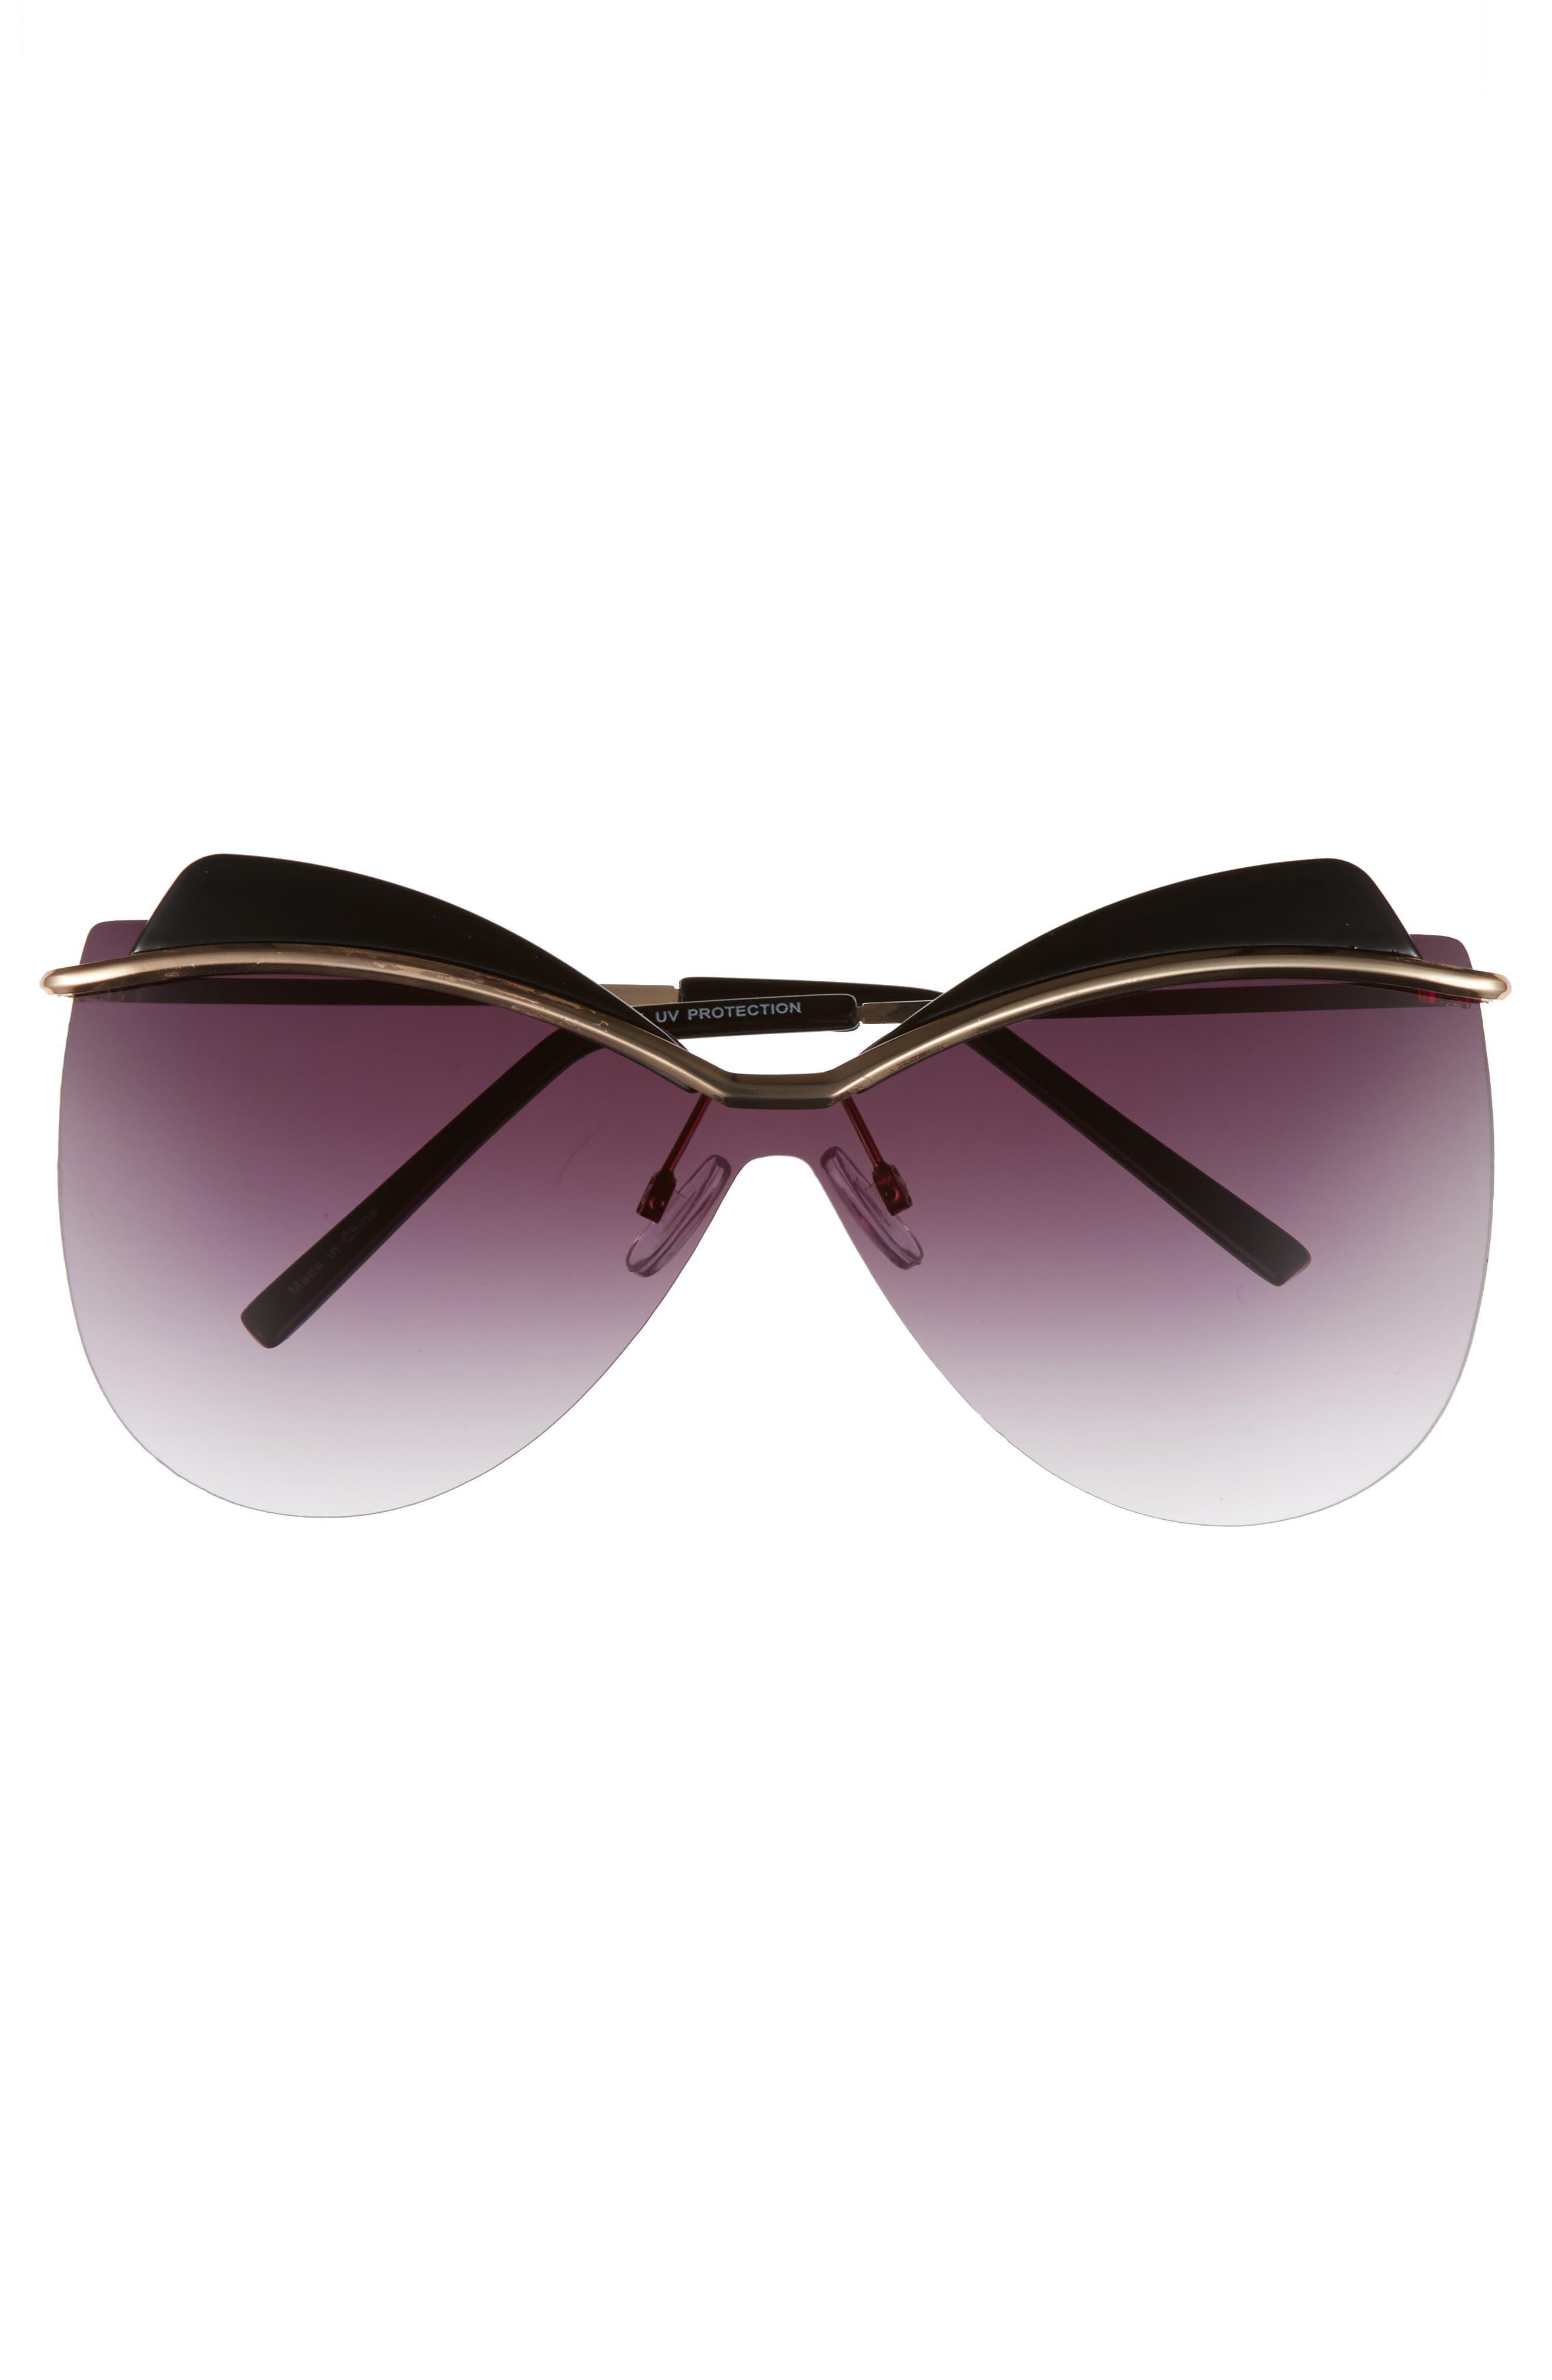 65mm Rimless Shield Sunglasses,                             Alternate thumbnail 3, color,                             Black/ Gold